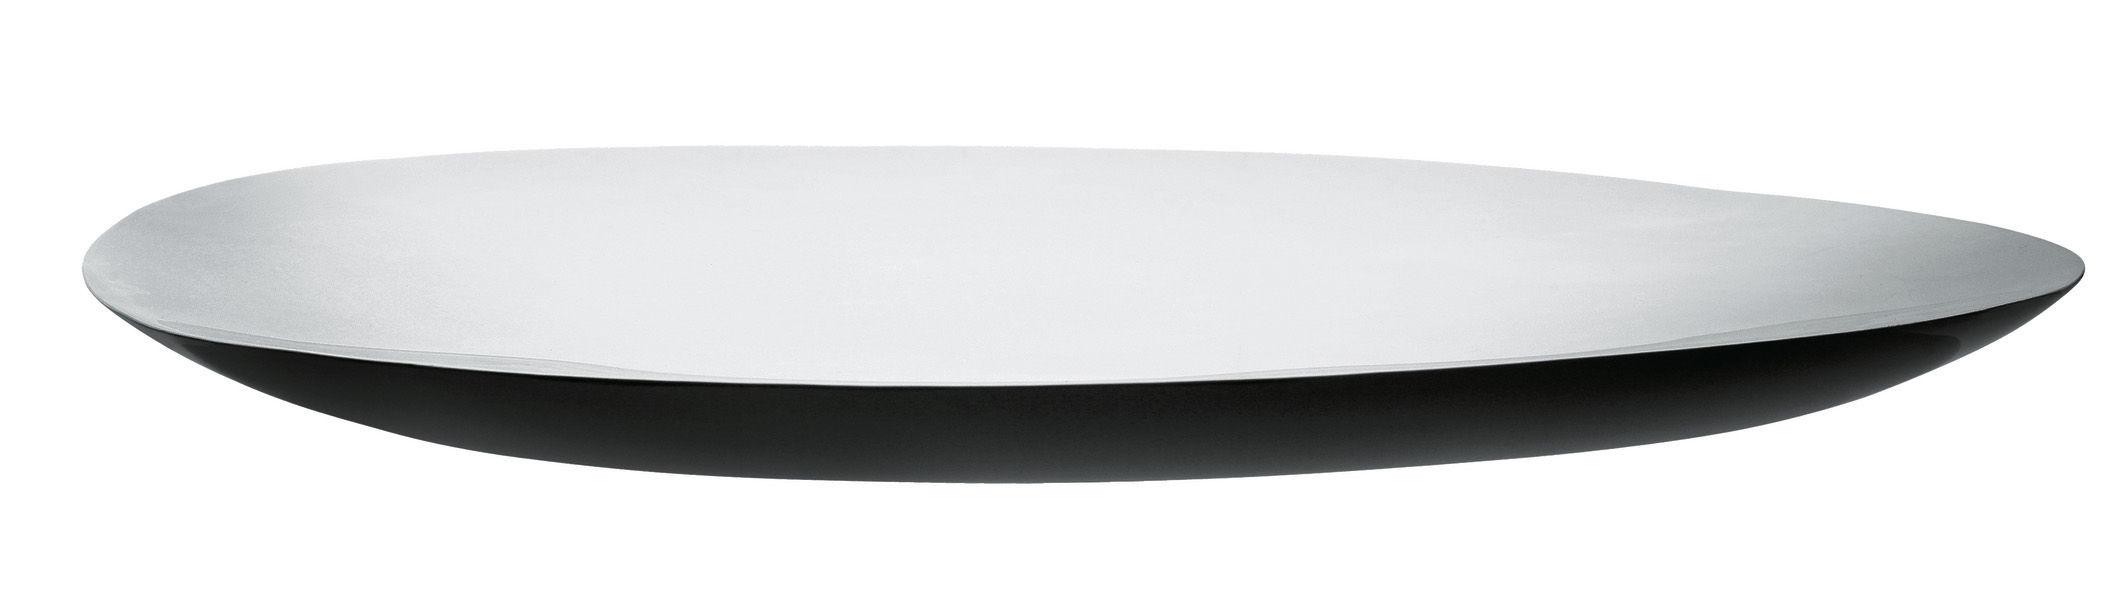 Tischkultur - Tabletts - Disco Volante Tablett - Alessi - Stahl - rostfreier Stahl